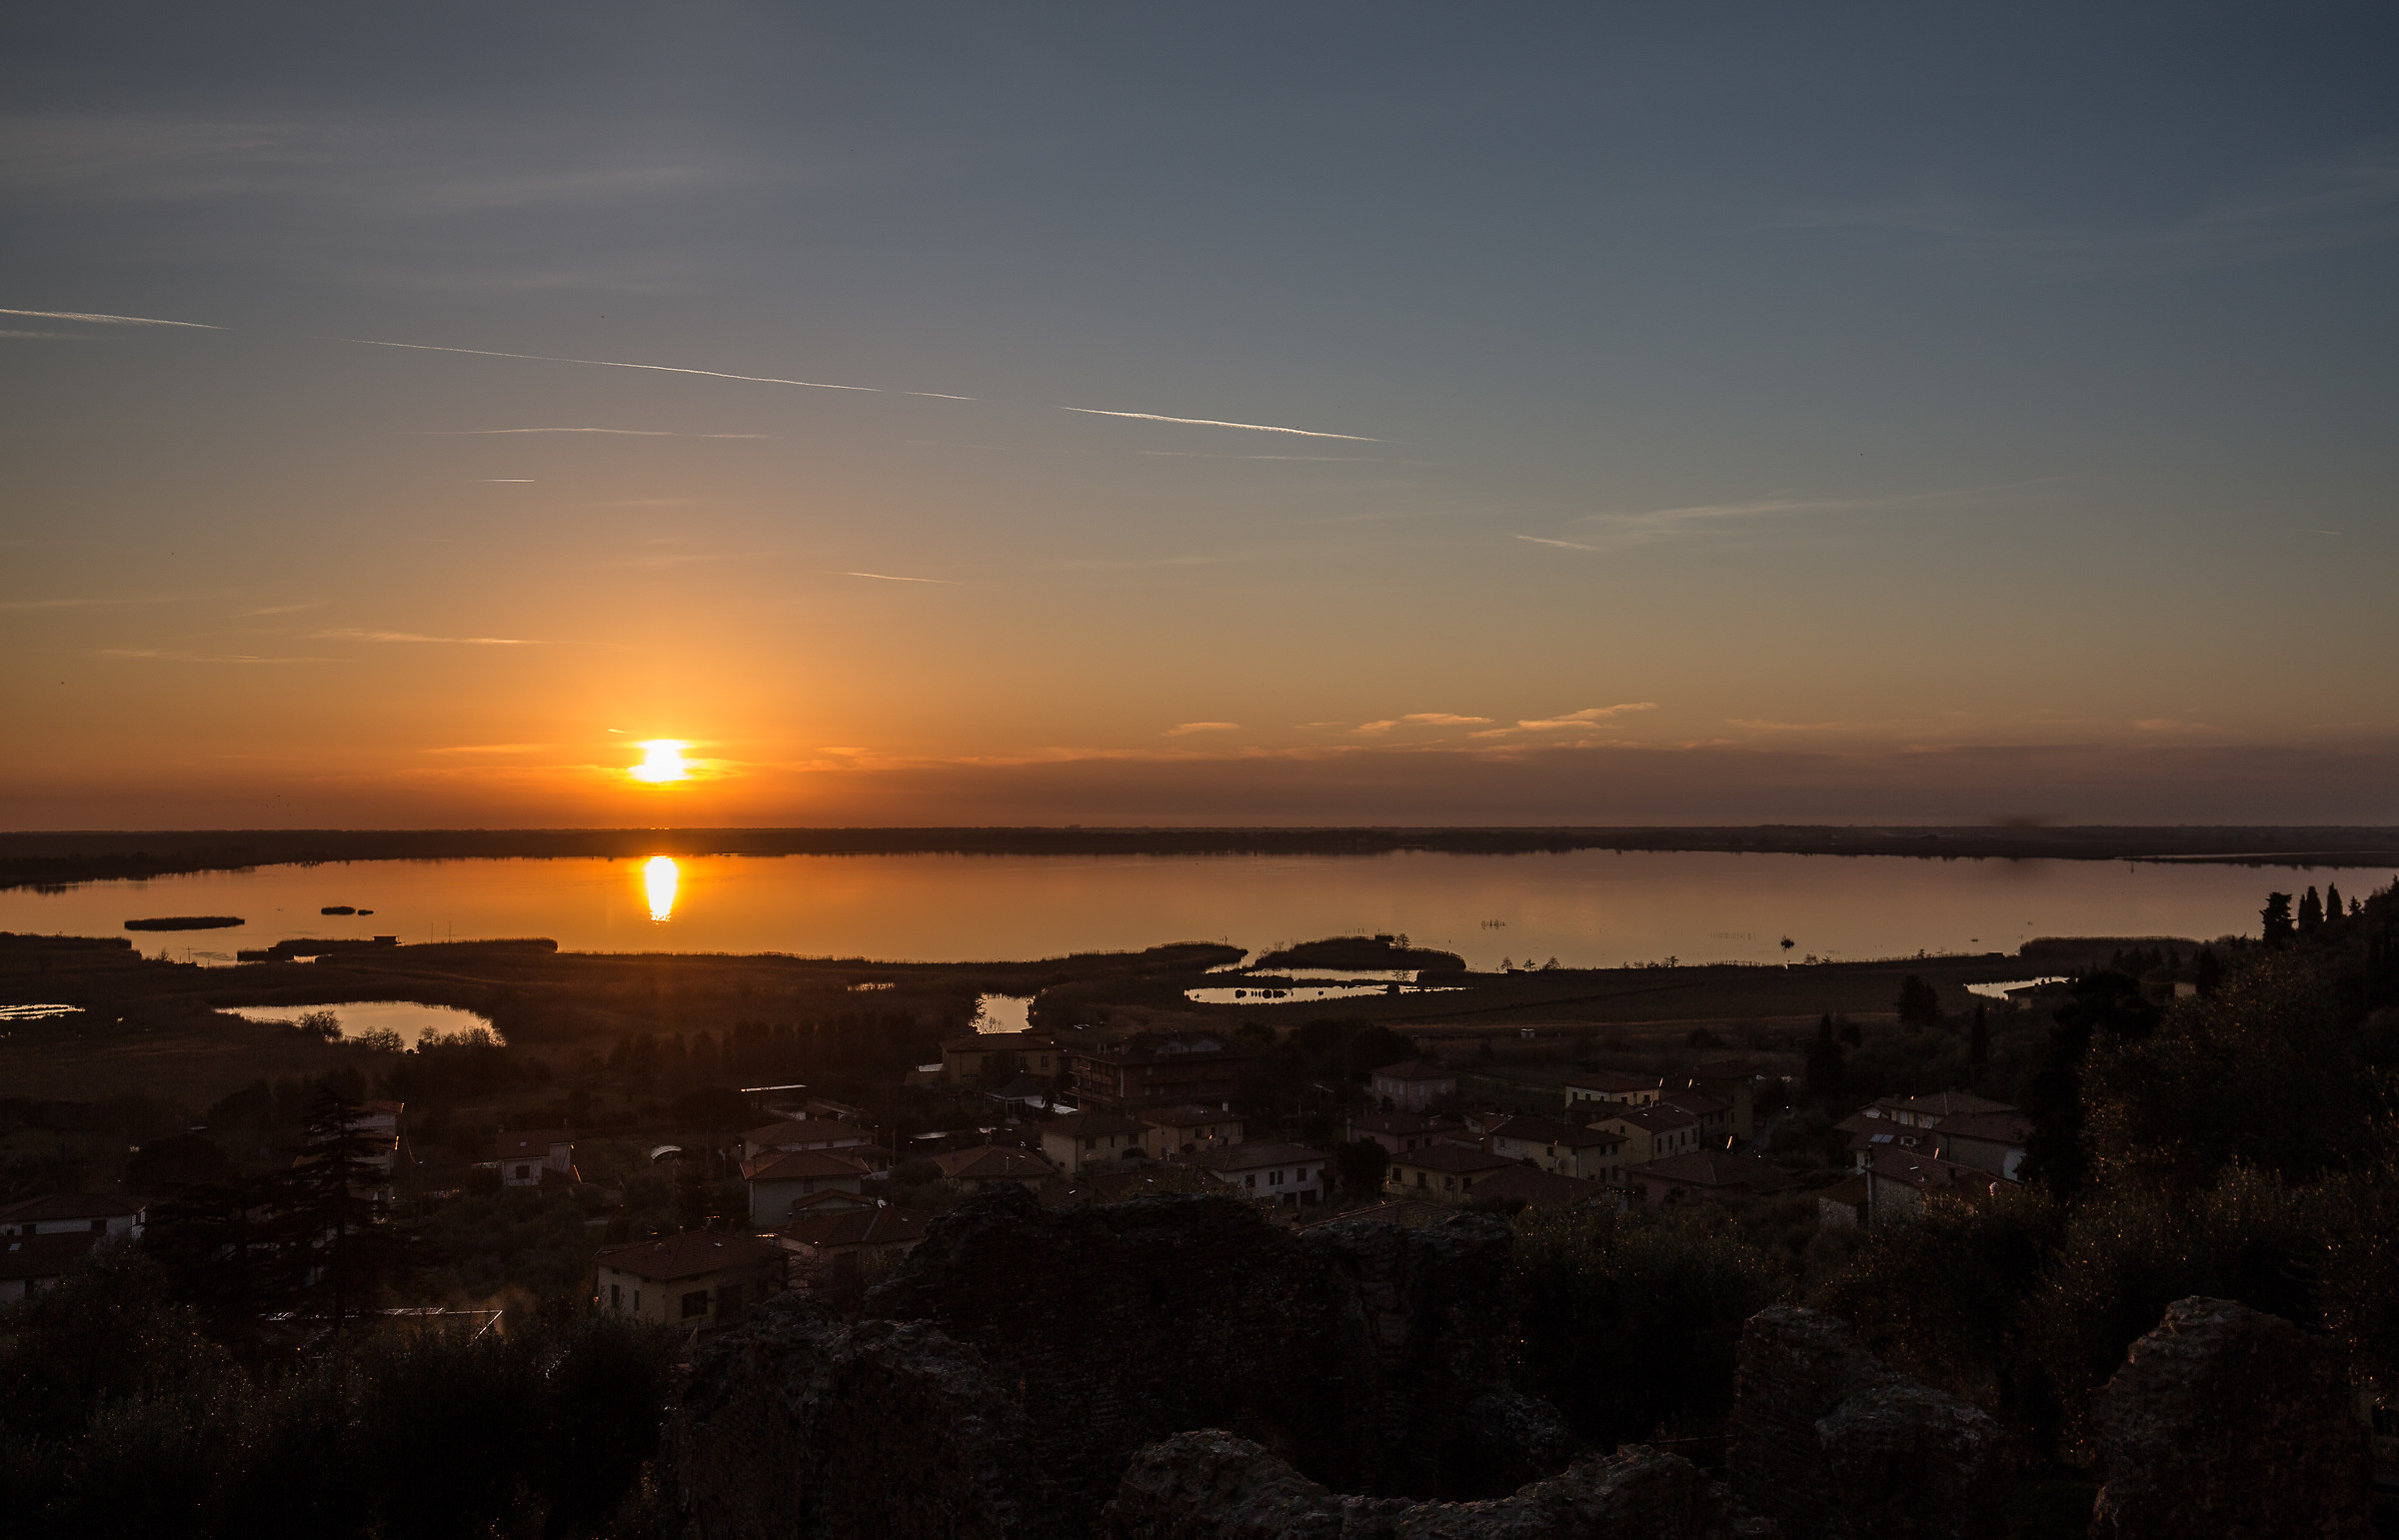 caldo tramonto all'oasi massacciuoli...